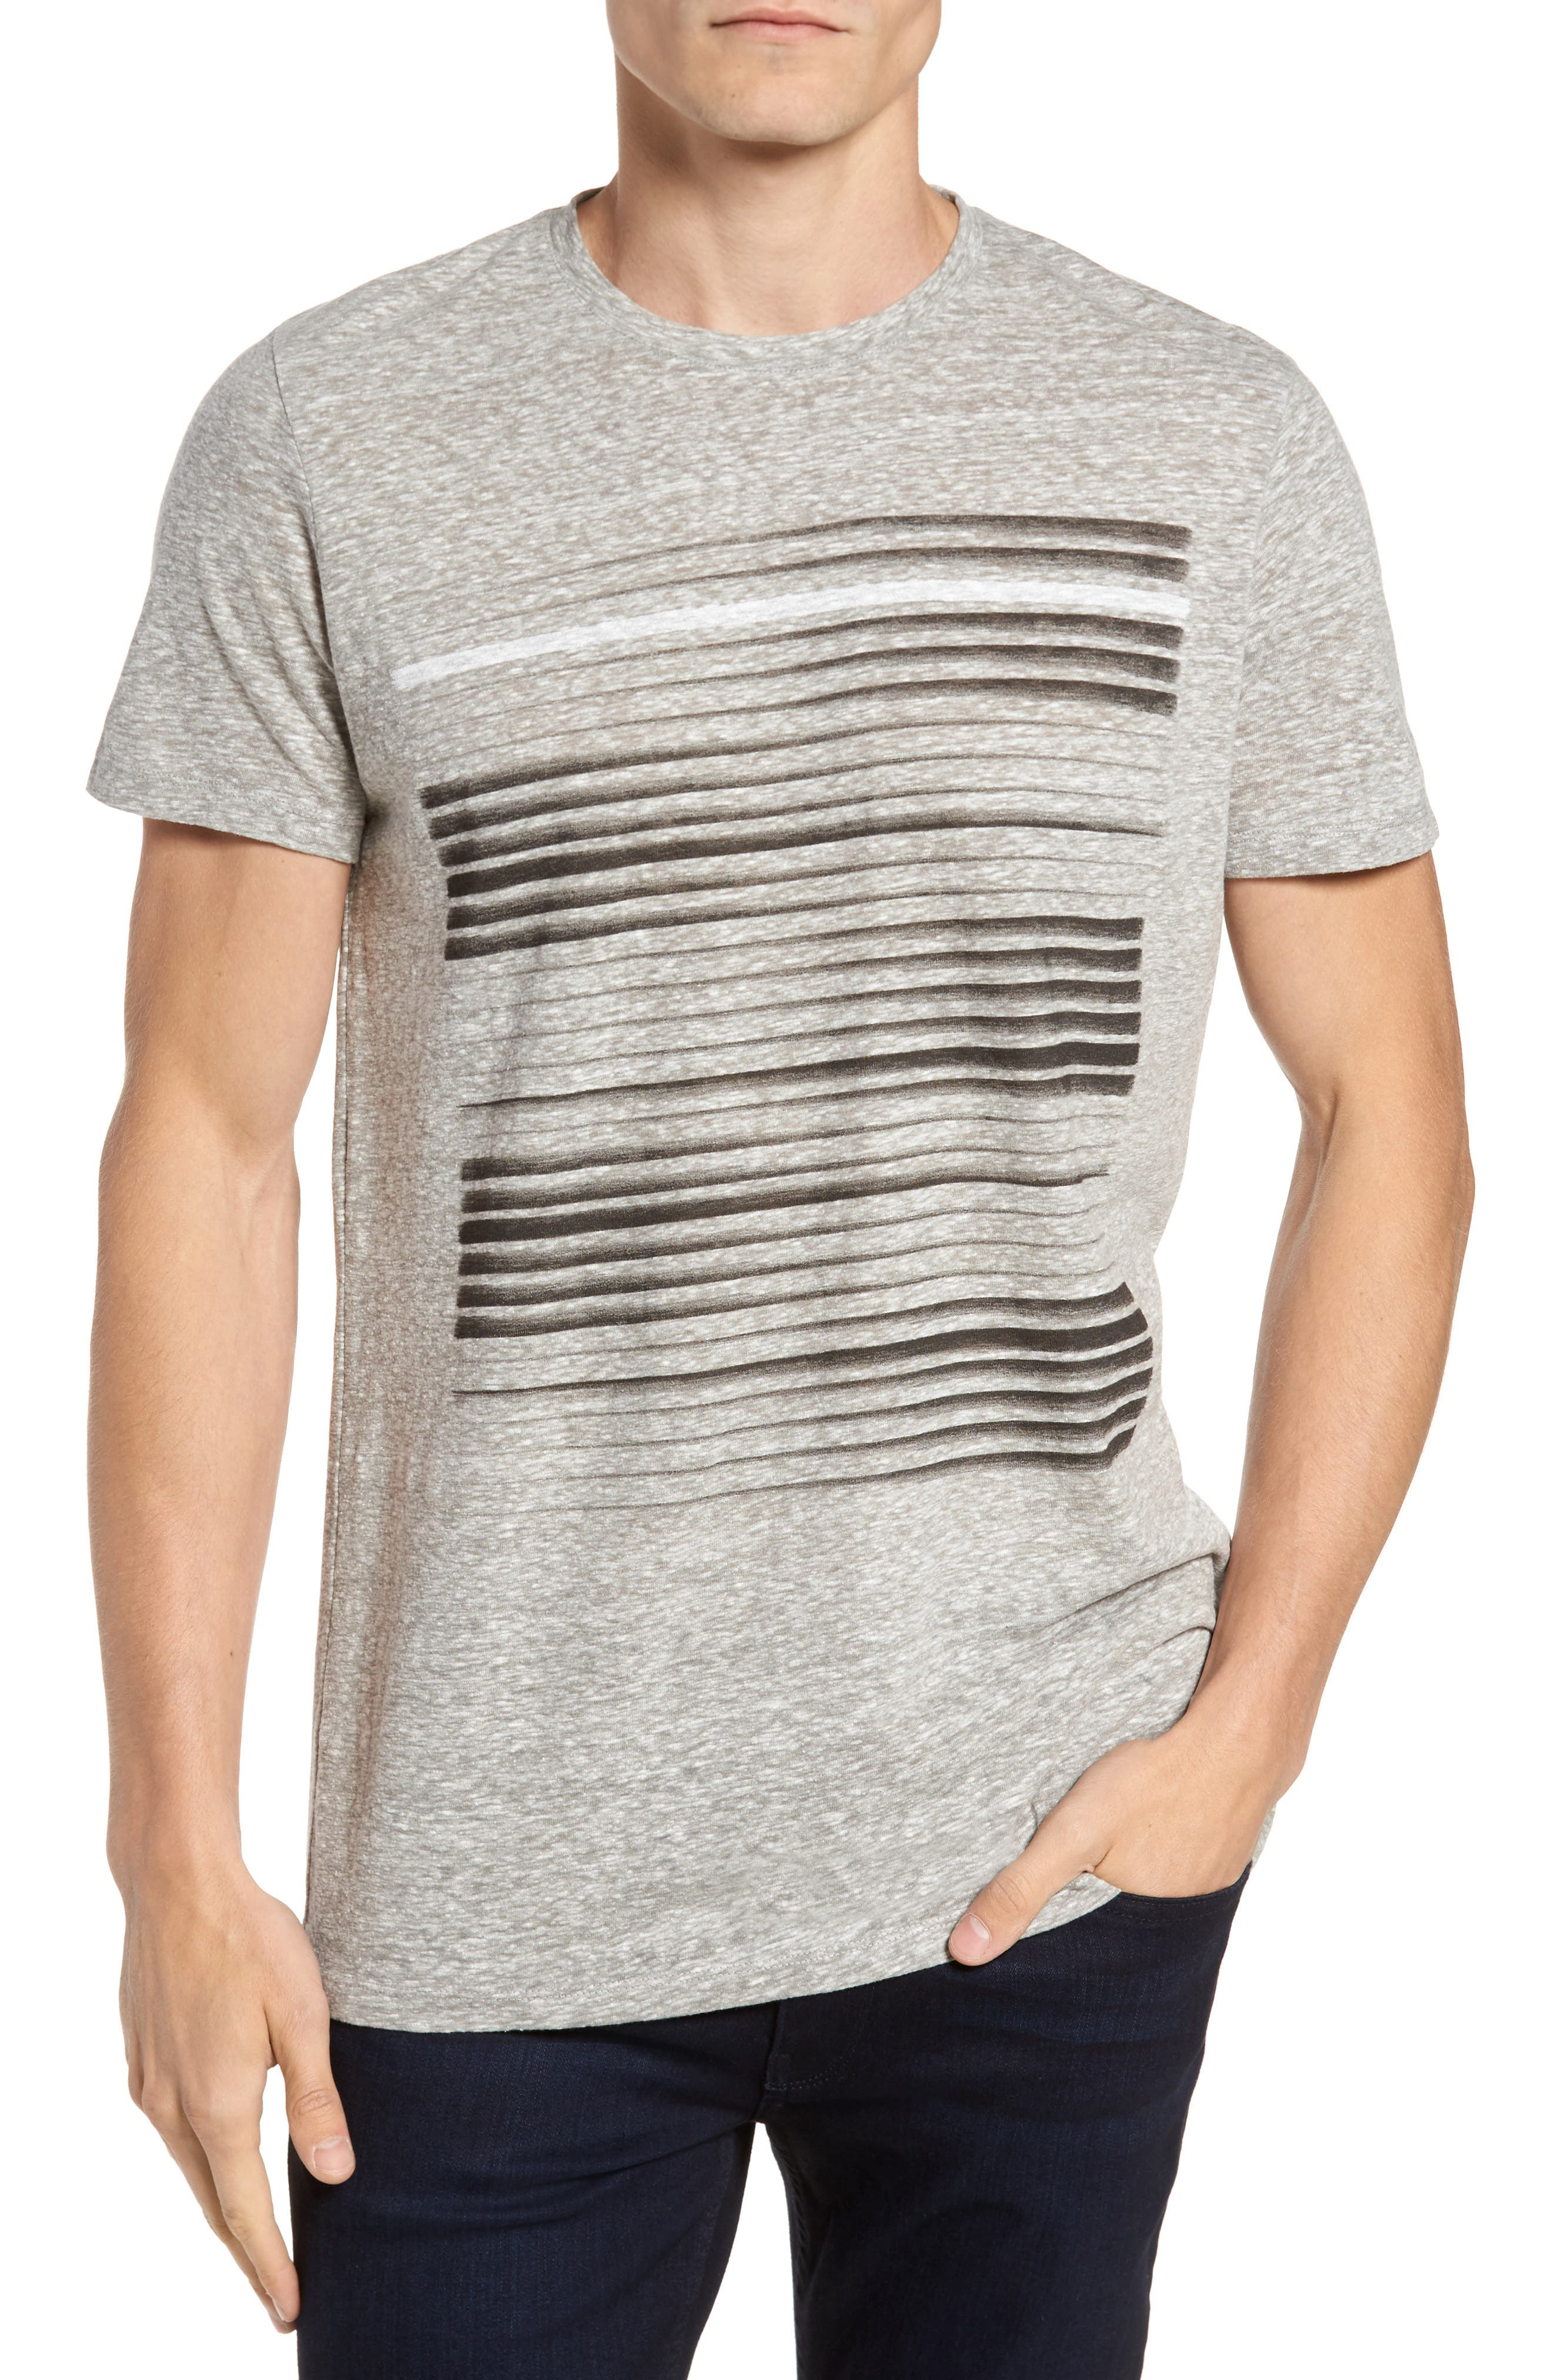 New Horizon T-Shirt,                         Main,                         color, Grey